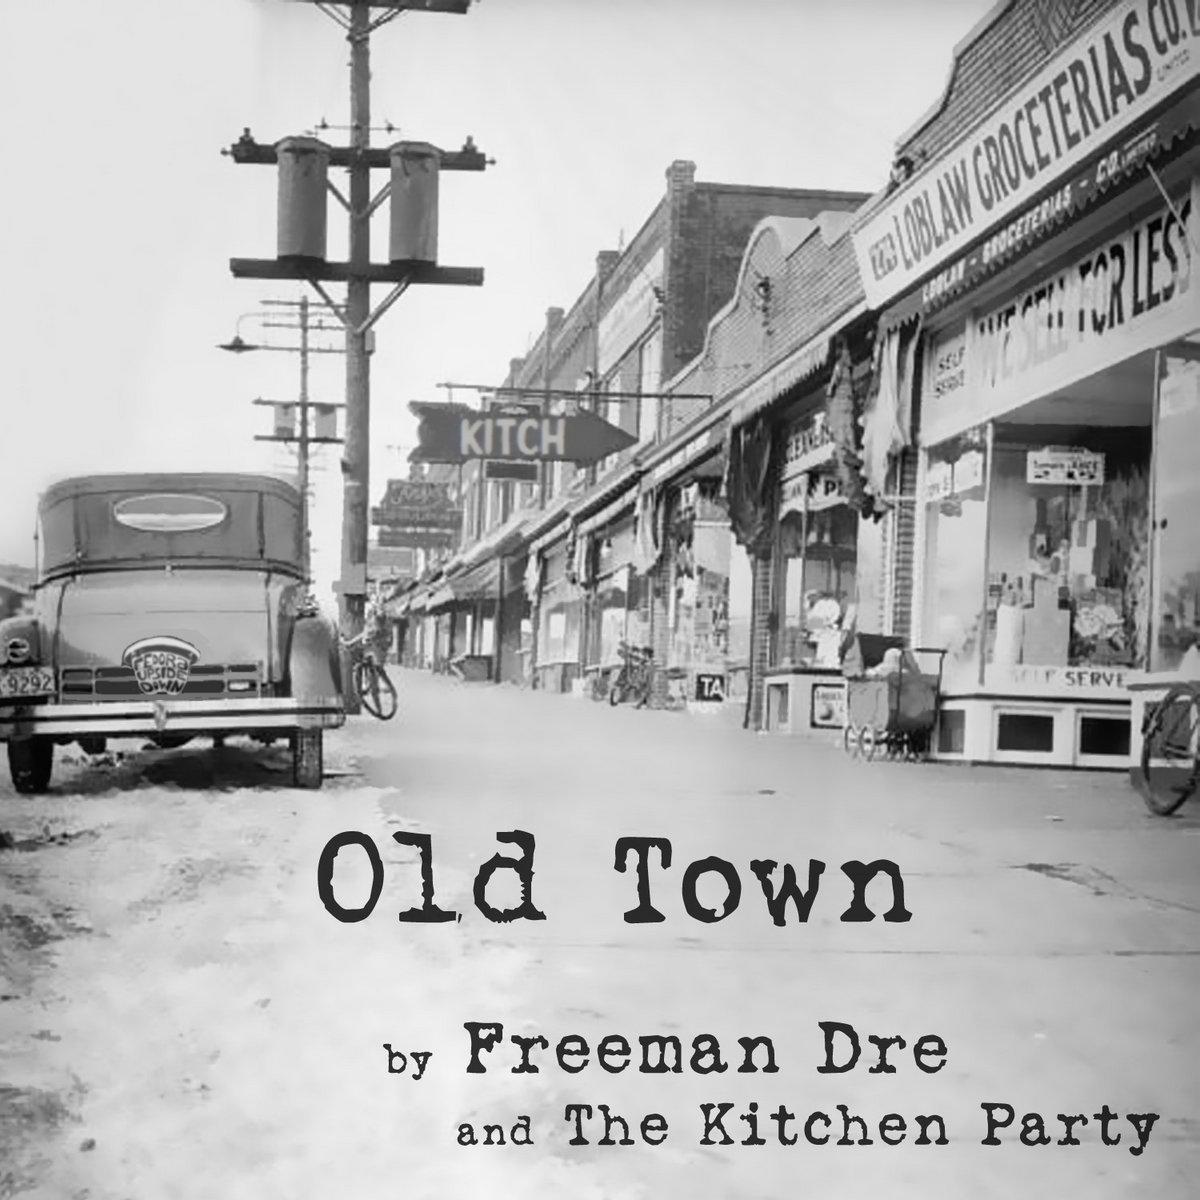 Music | Freeman Dre & The Kitchen Party